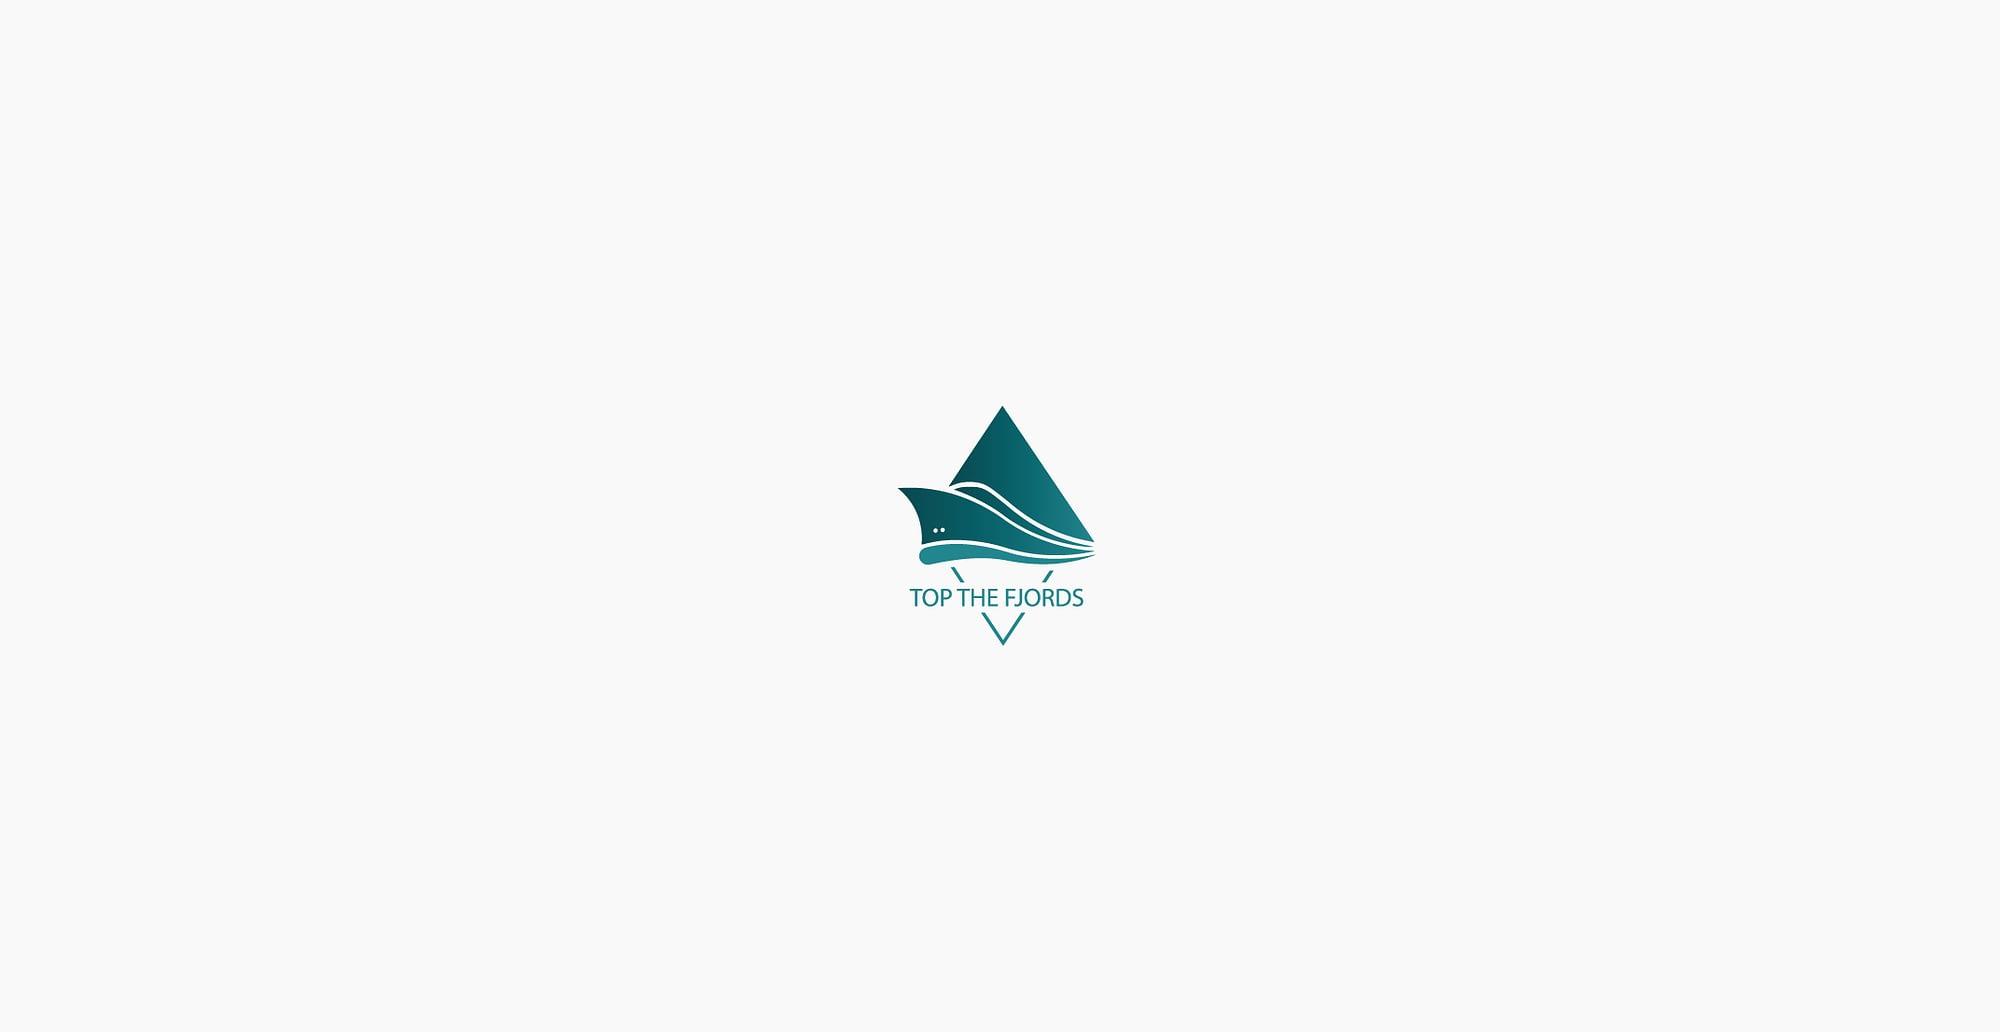 Logo designe for Top The Fjords